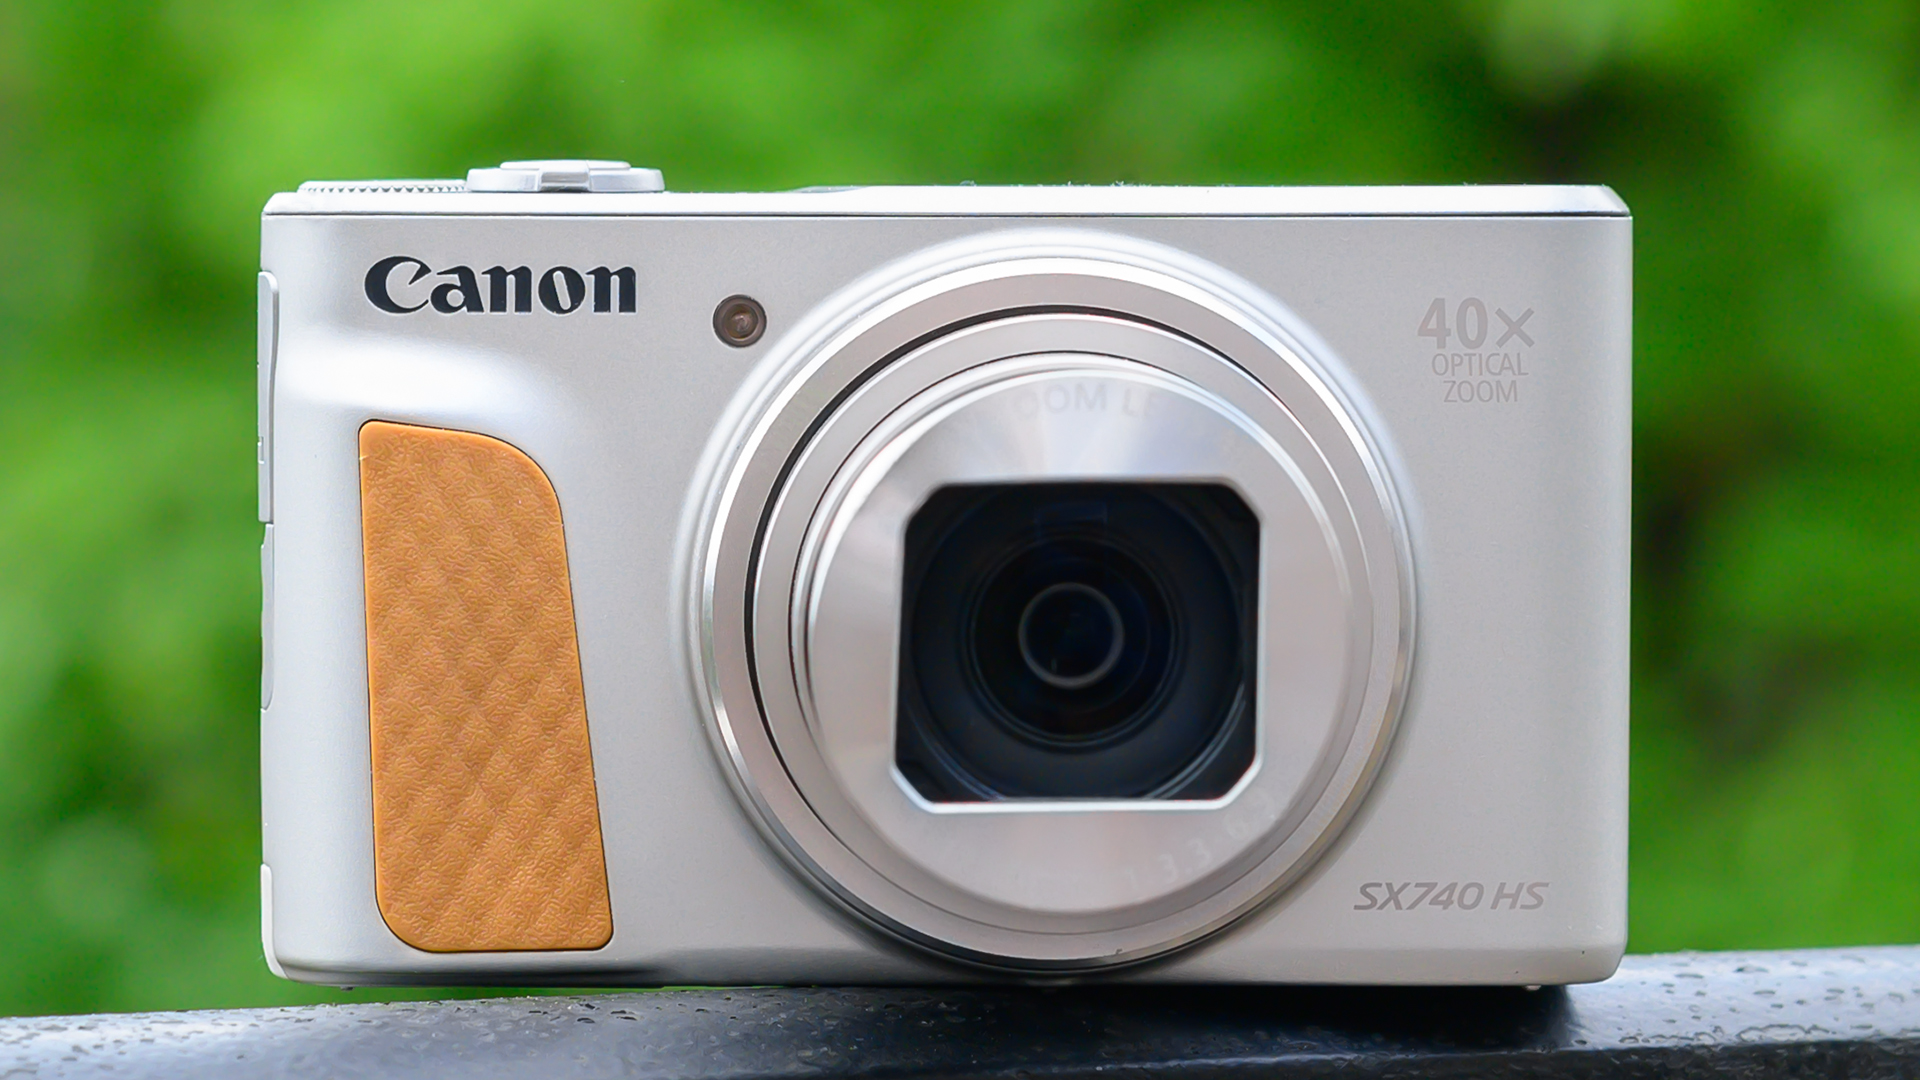 Canon Powershot Sx740 Hs Review Techradar